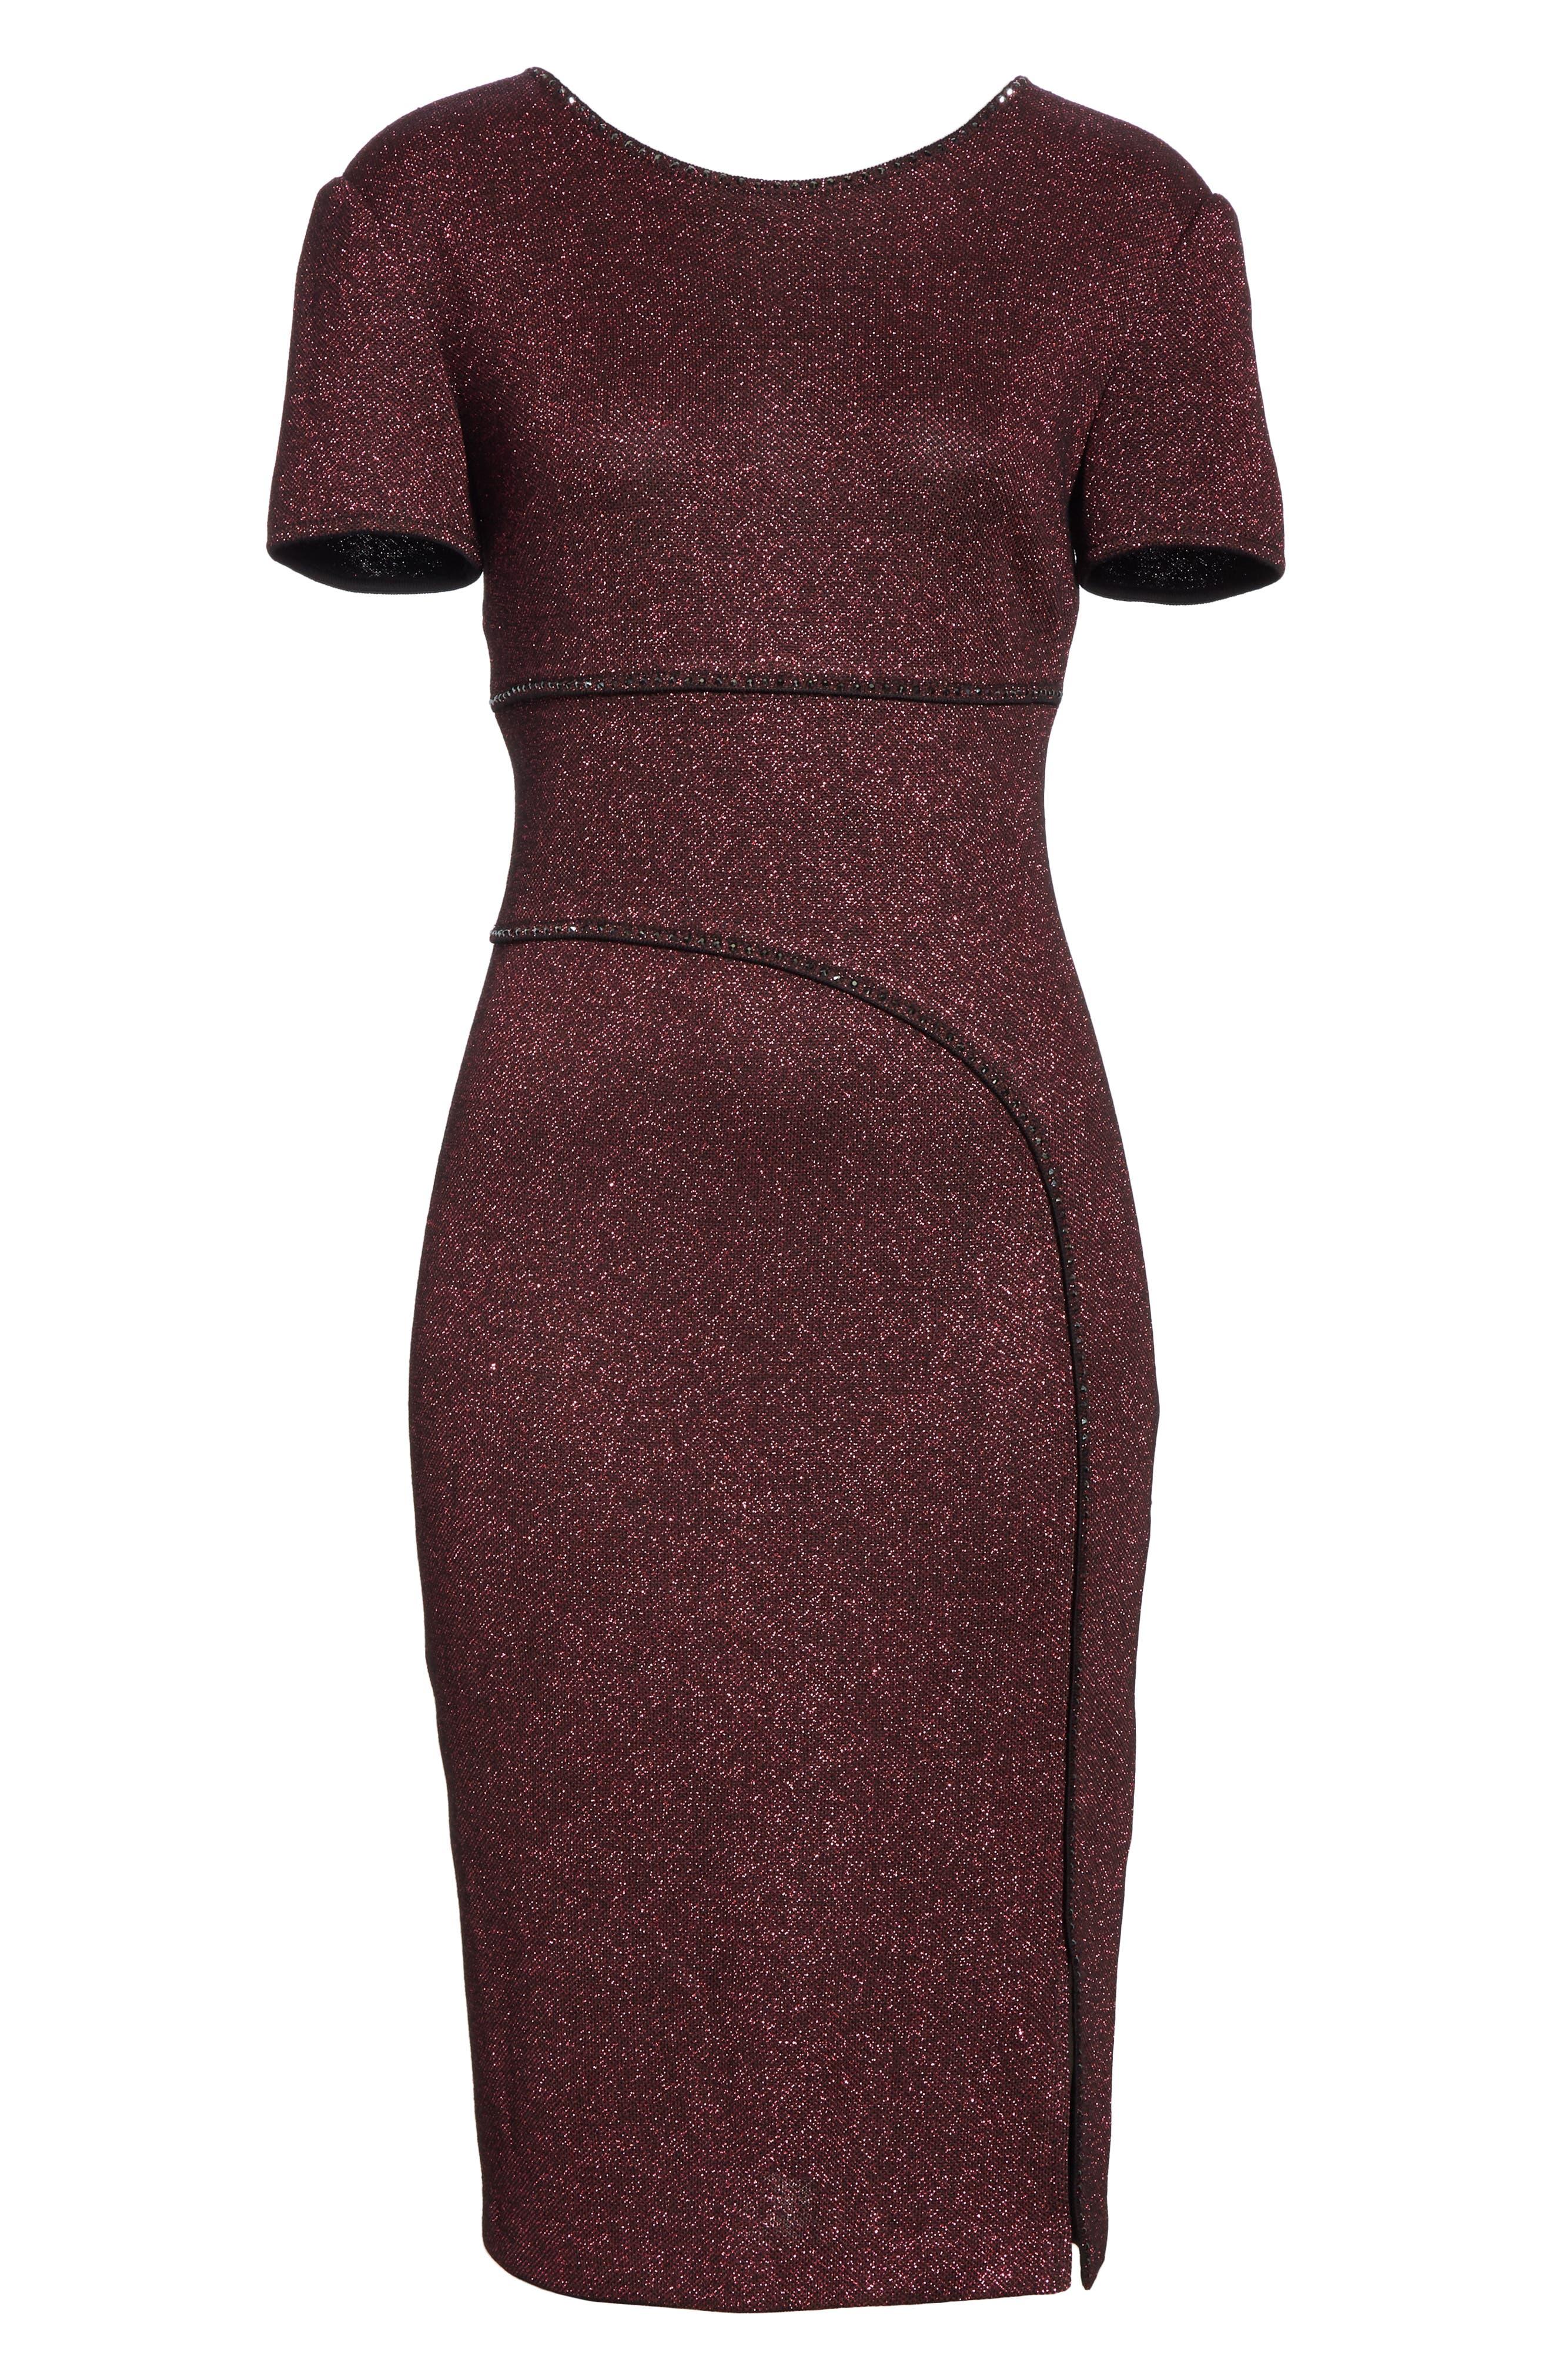 ST. JOHN COLLECTION, Mod Metallic Knit Sheath Dress, Alternate thumbnail 7, color, DARK PINK MULTI